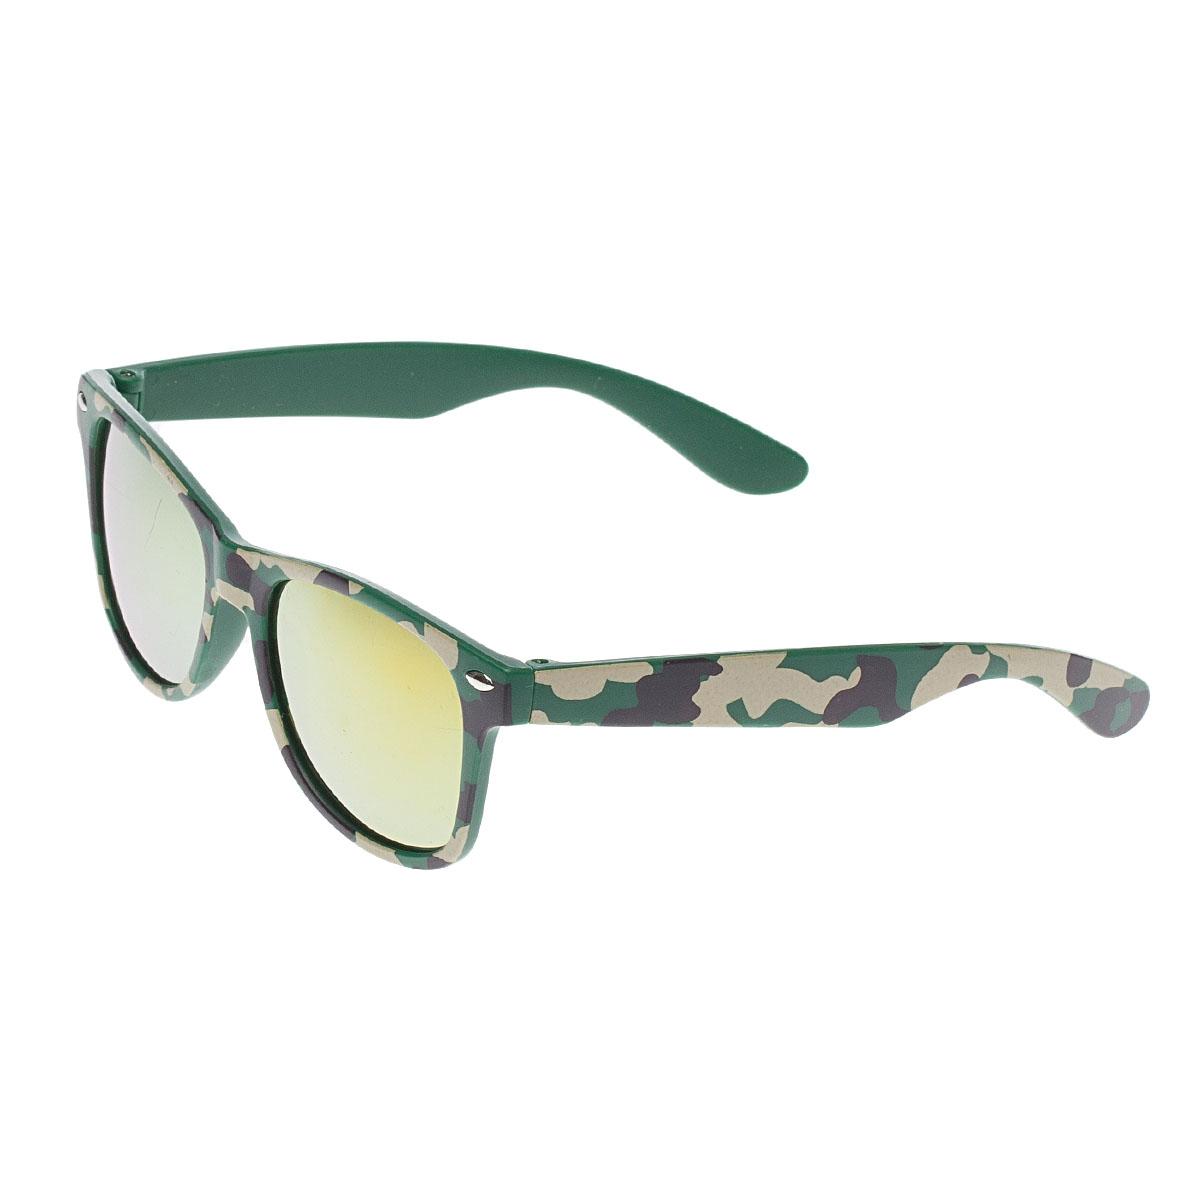 Фото - Очки солнцезащитные Sevenext, 23032-29 очки солнцезащитные sevenext 23032 28